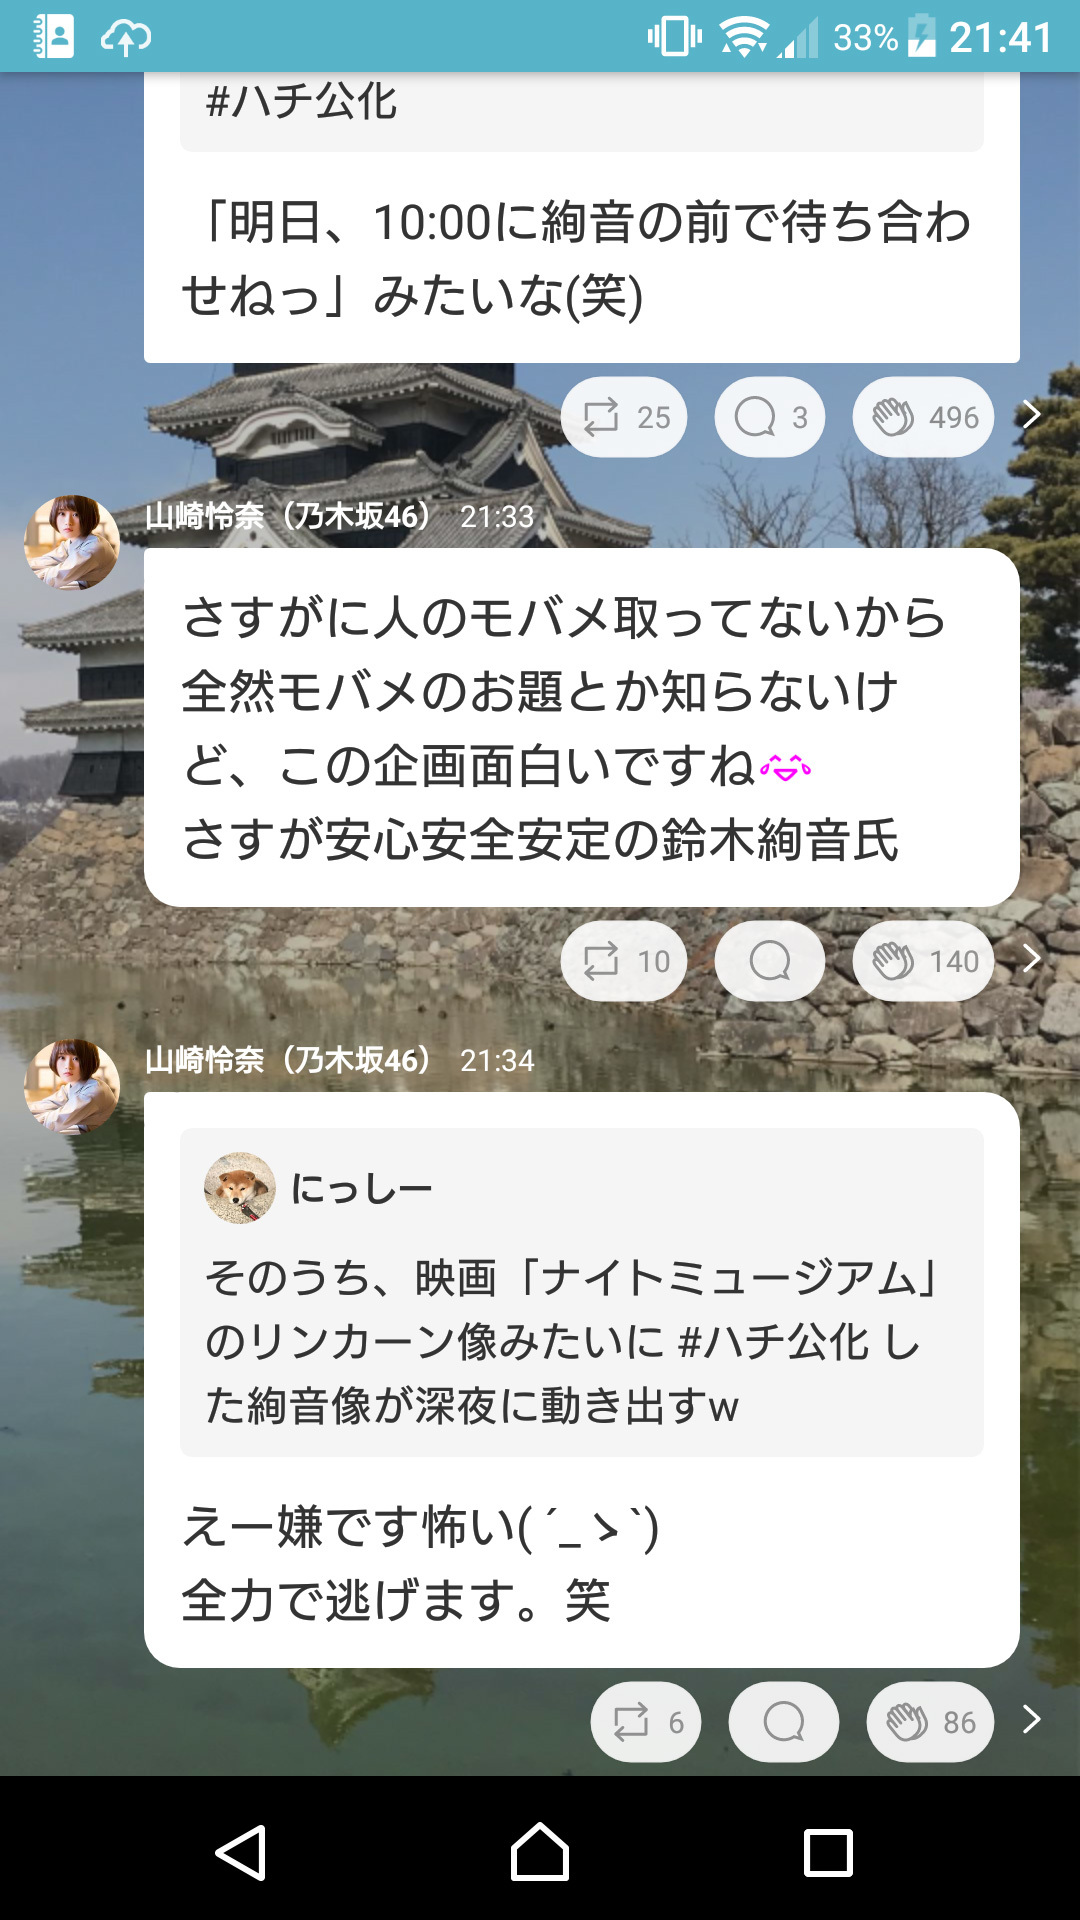 安心安全安定の鈴木絢音氏